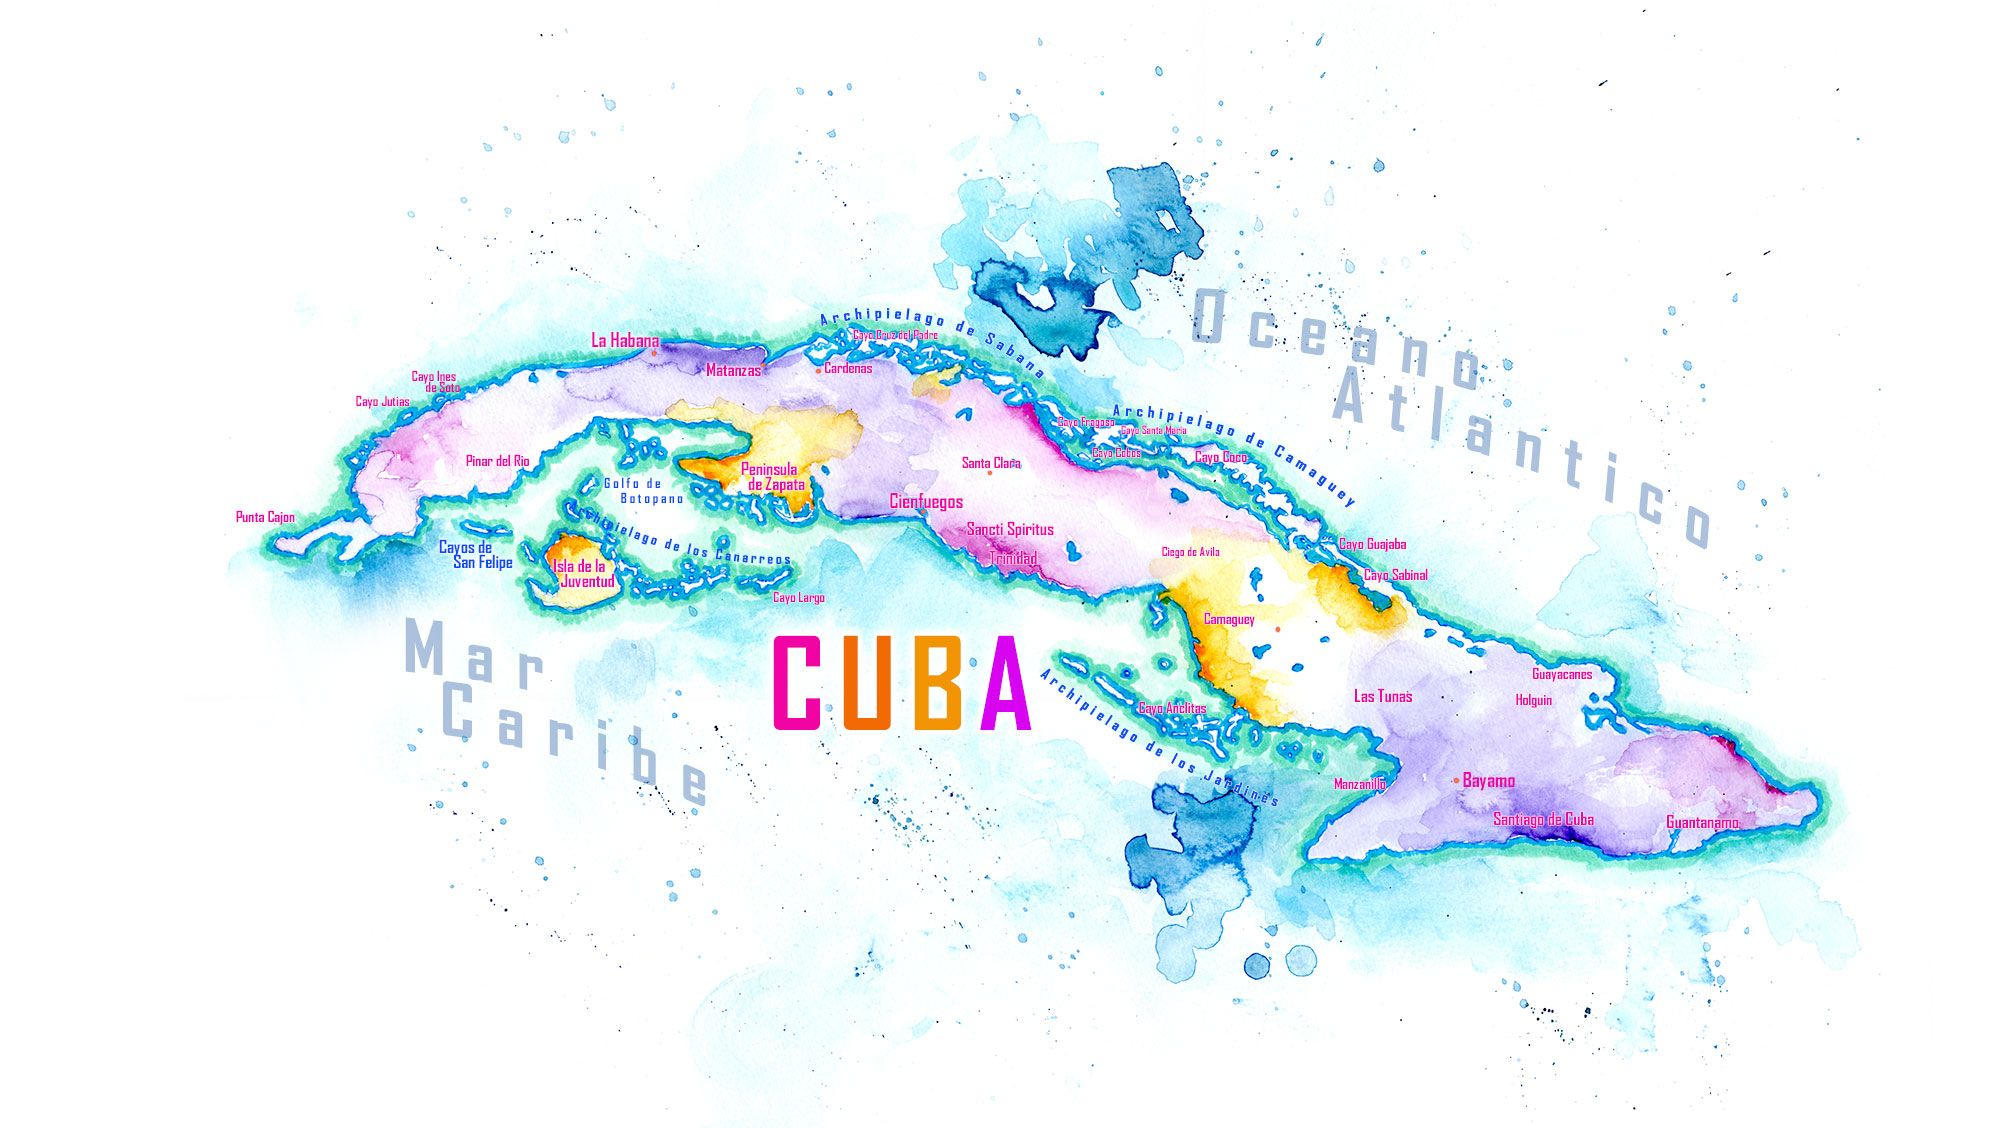 Map Usa And Cuba